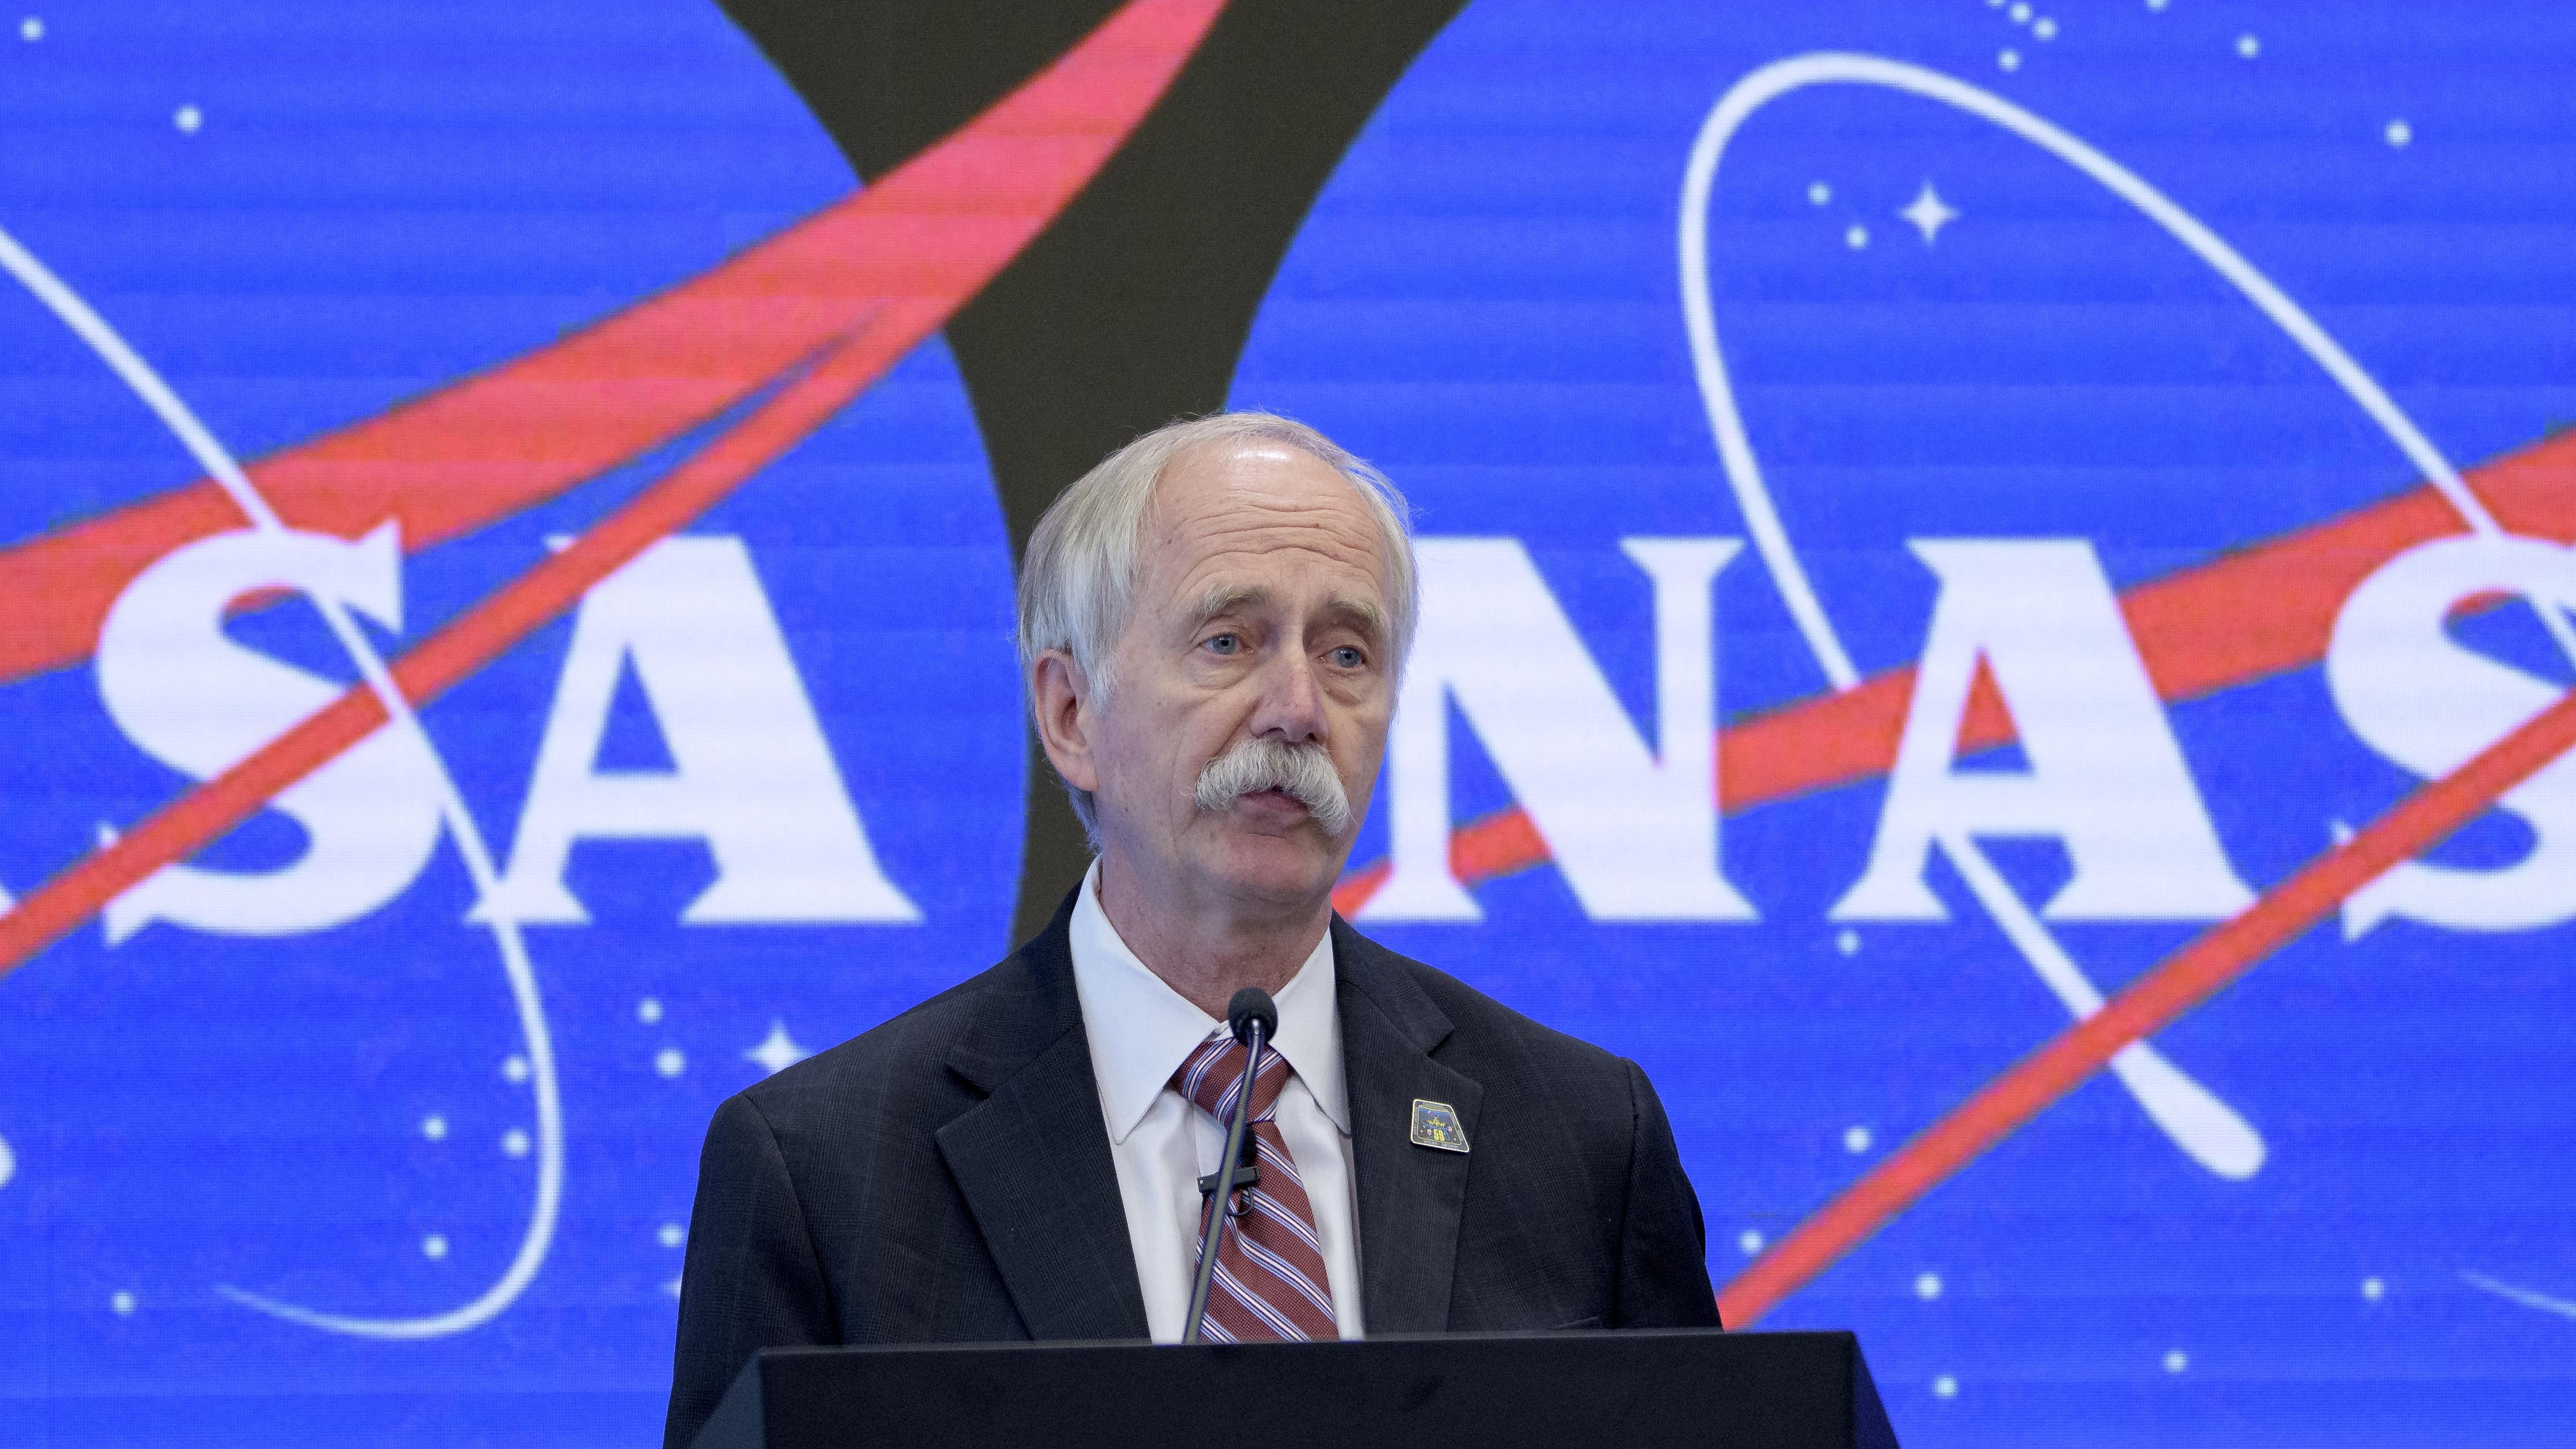 NASA associate administrator Bill Gerstenmaier talks to reporters in June 2019.